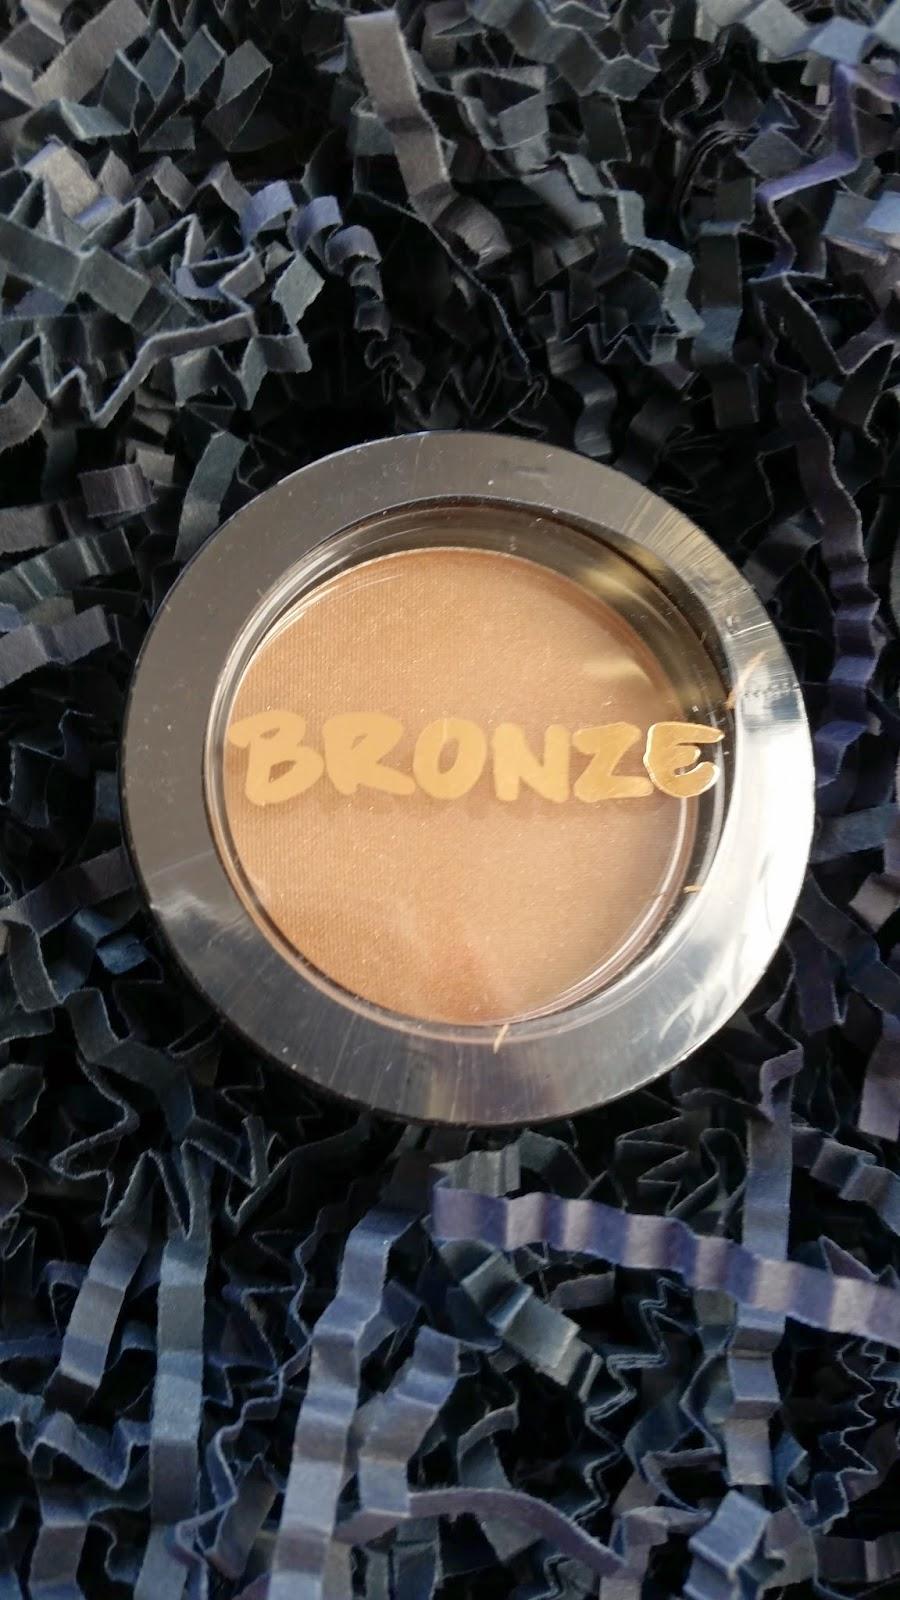 Model Bronze - Shimmer - www.annitschkasblog.de